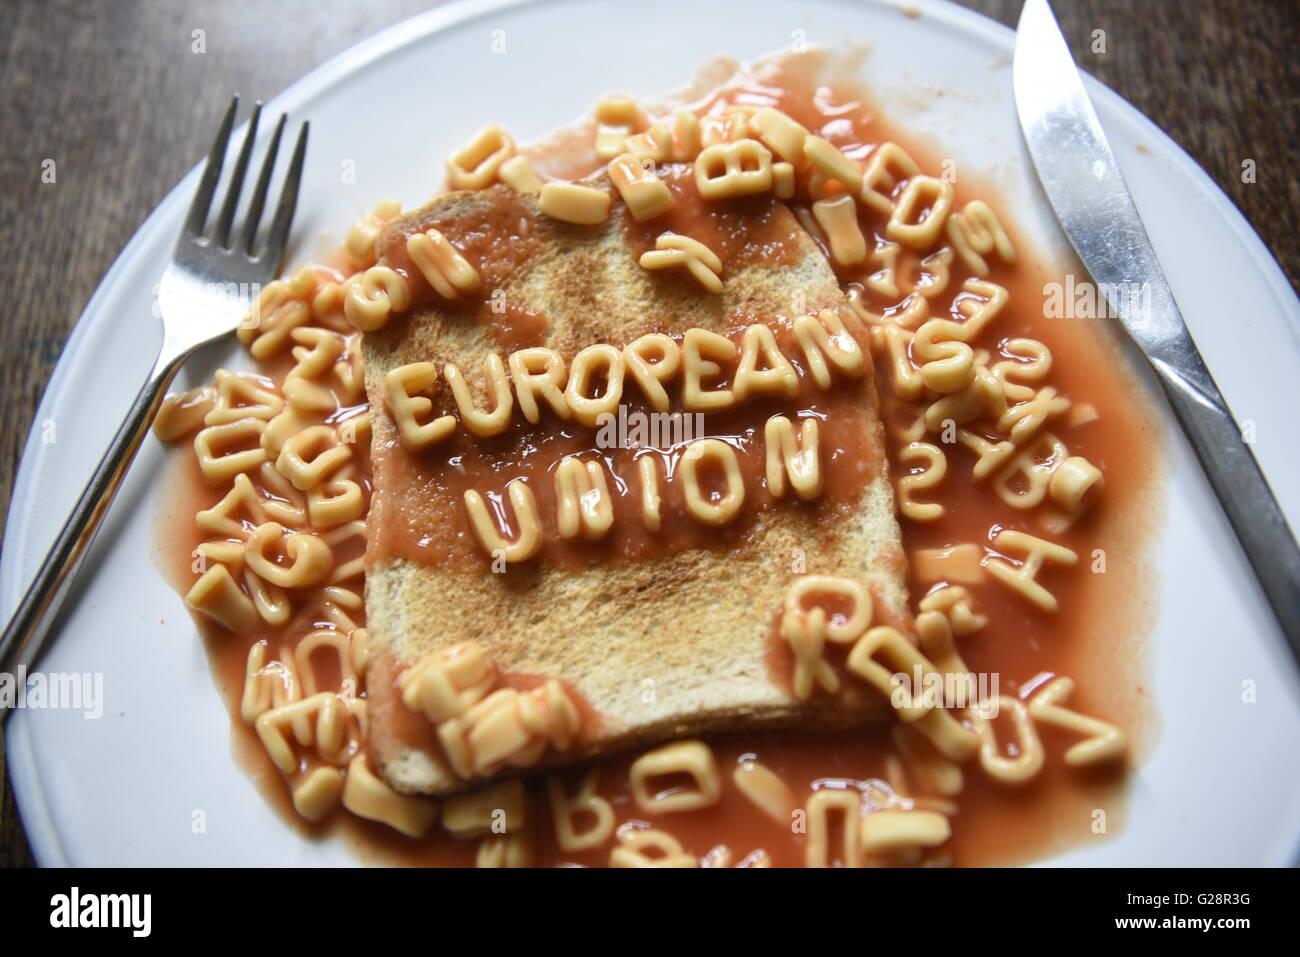 European Union - EU Referendum concept image in kids alphabet pasta on toast - Stock Image